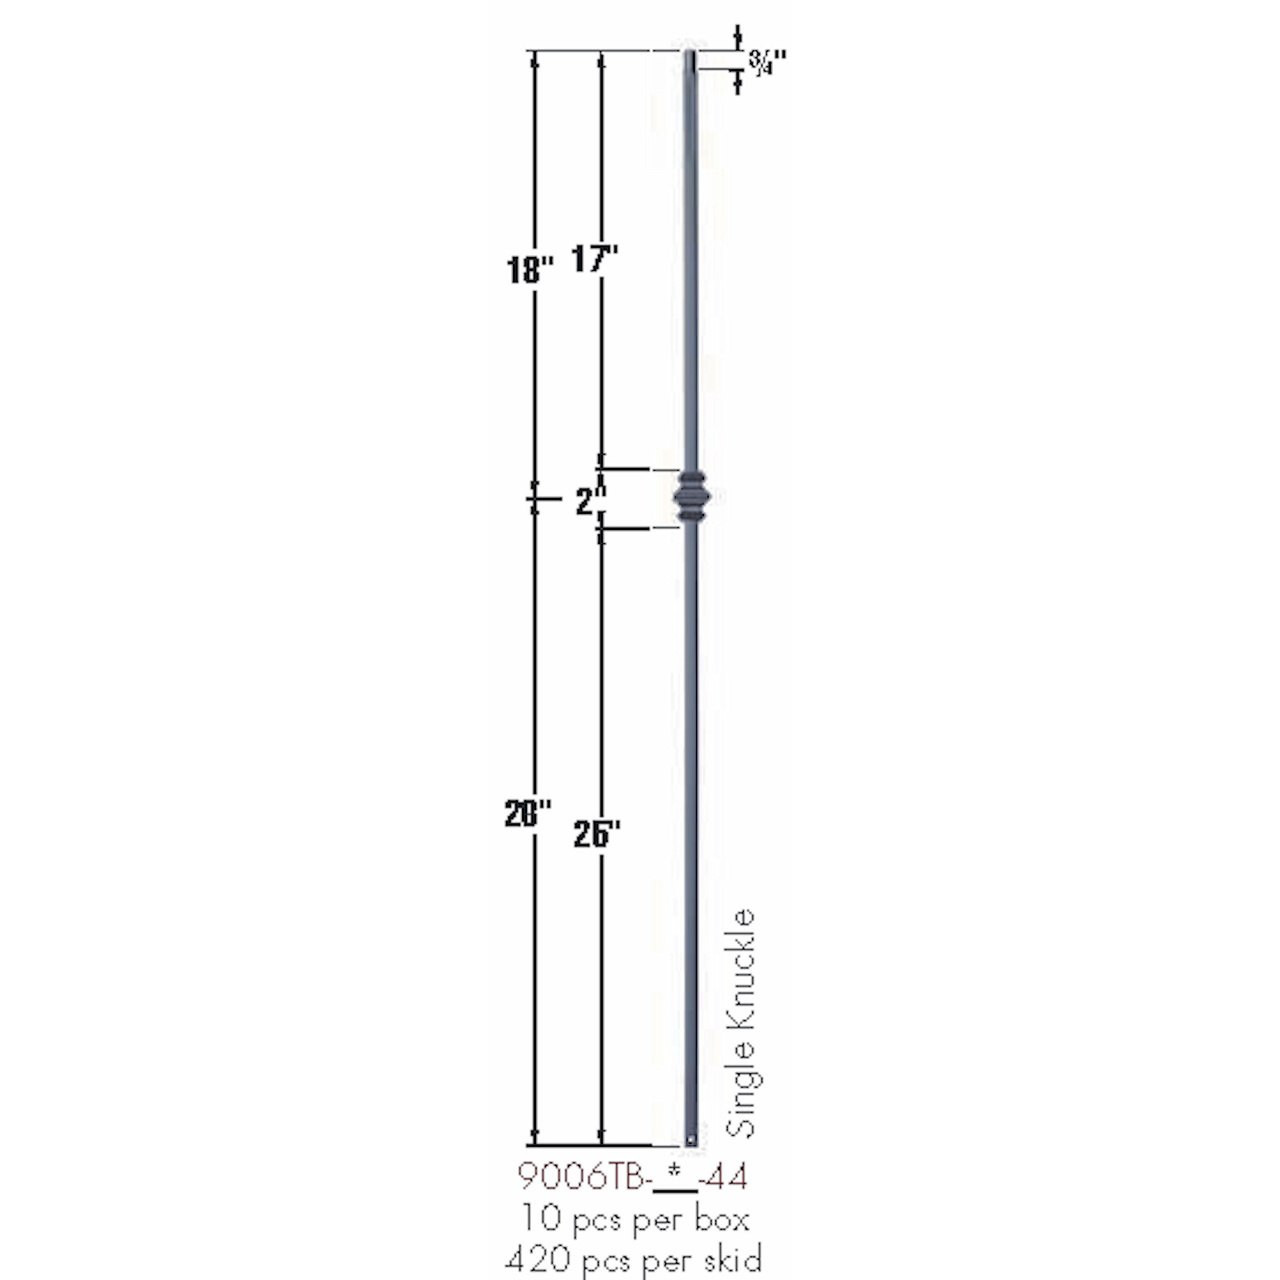 9006TB Single Knuckle Tubular Steel Baluster Dimensional Information